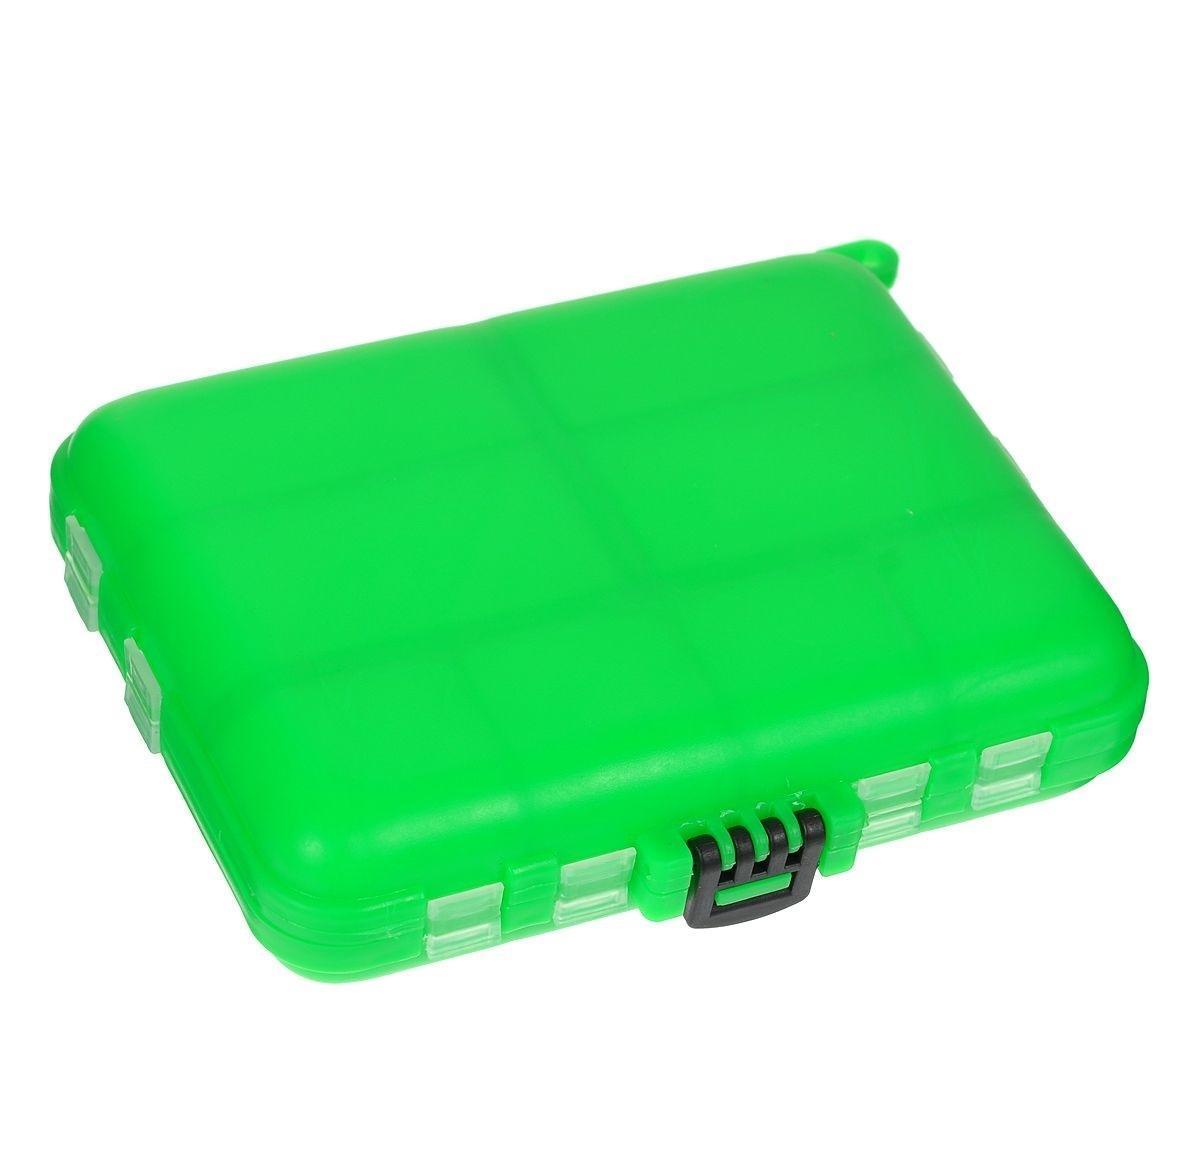 Органайзер для мелочей, двухсторонний, цвет: зеленый 12 х 10 х 2,5 см ключ рожковый vorel 12х13 мм